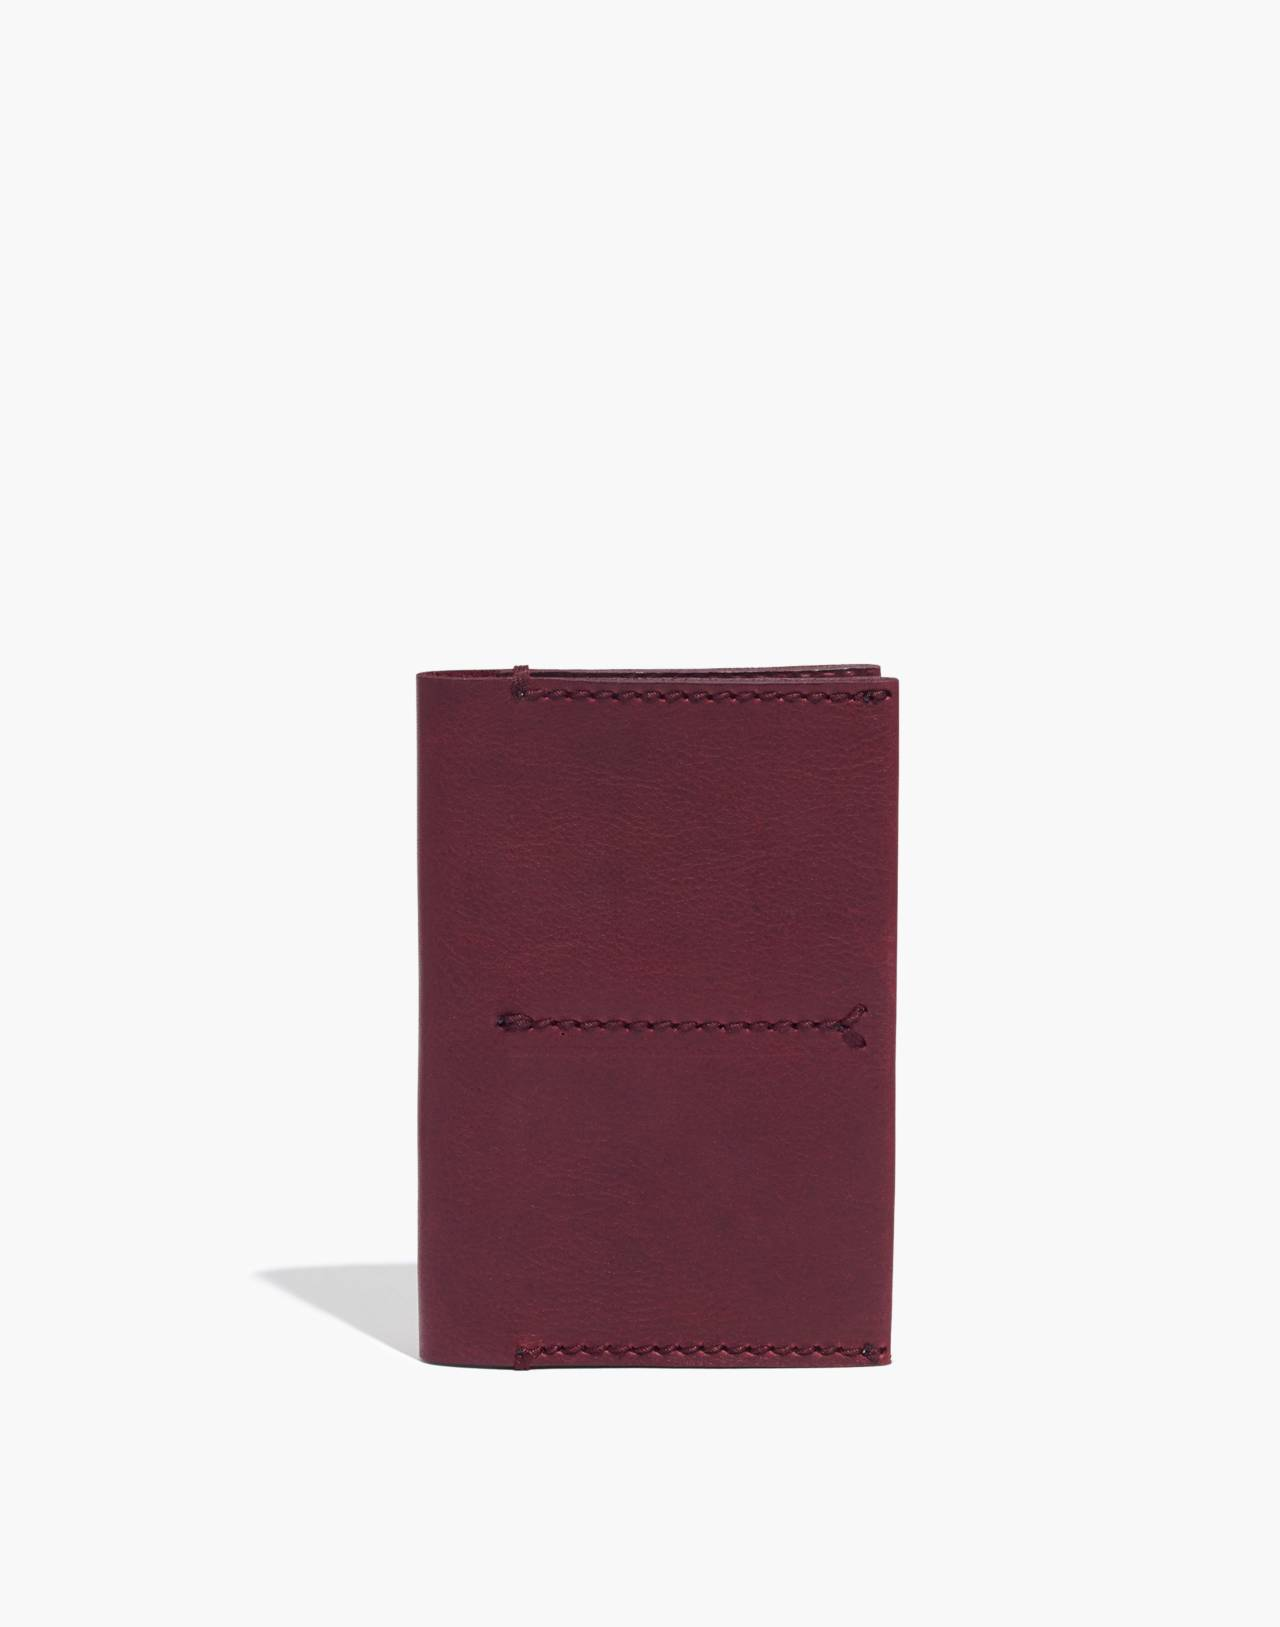 The Leather Passport Case in dark cabernet image 1